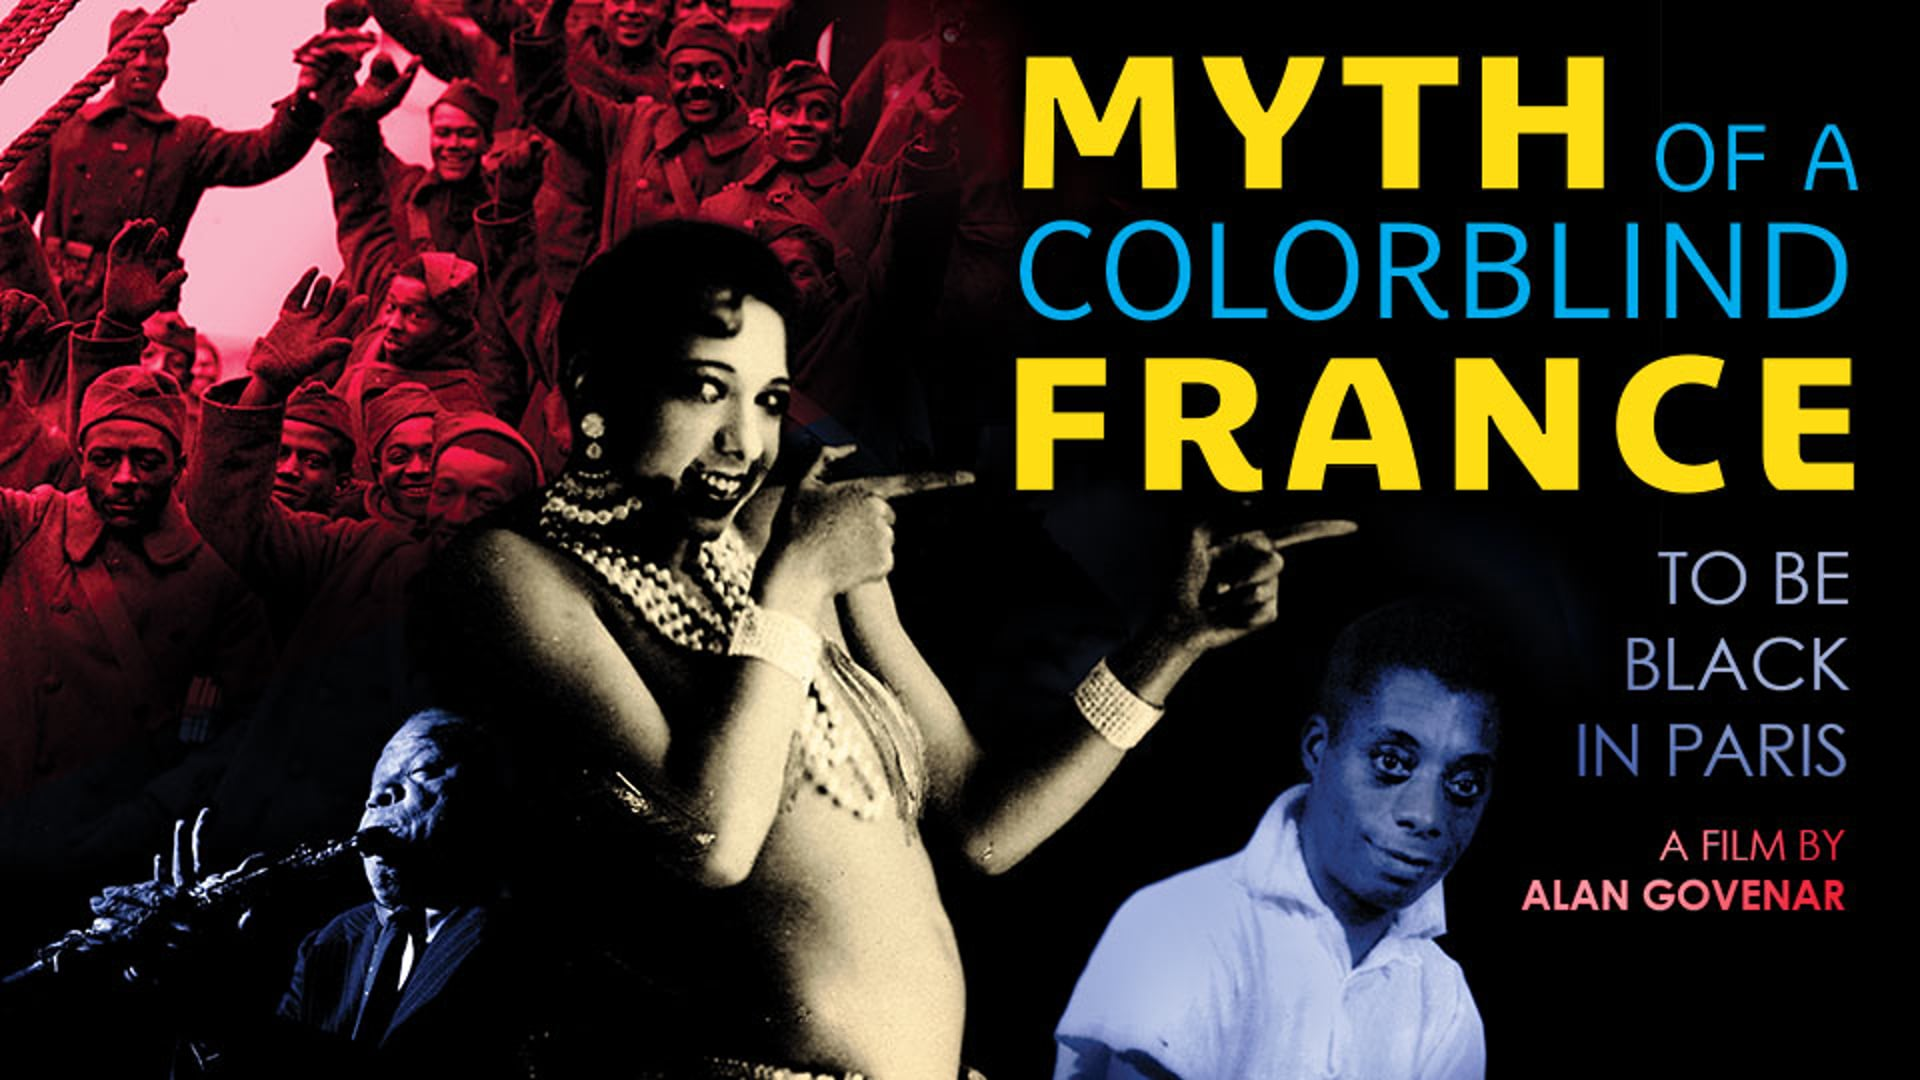 Myth of a Colorblind France - Trailer